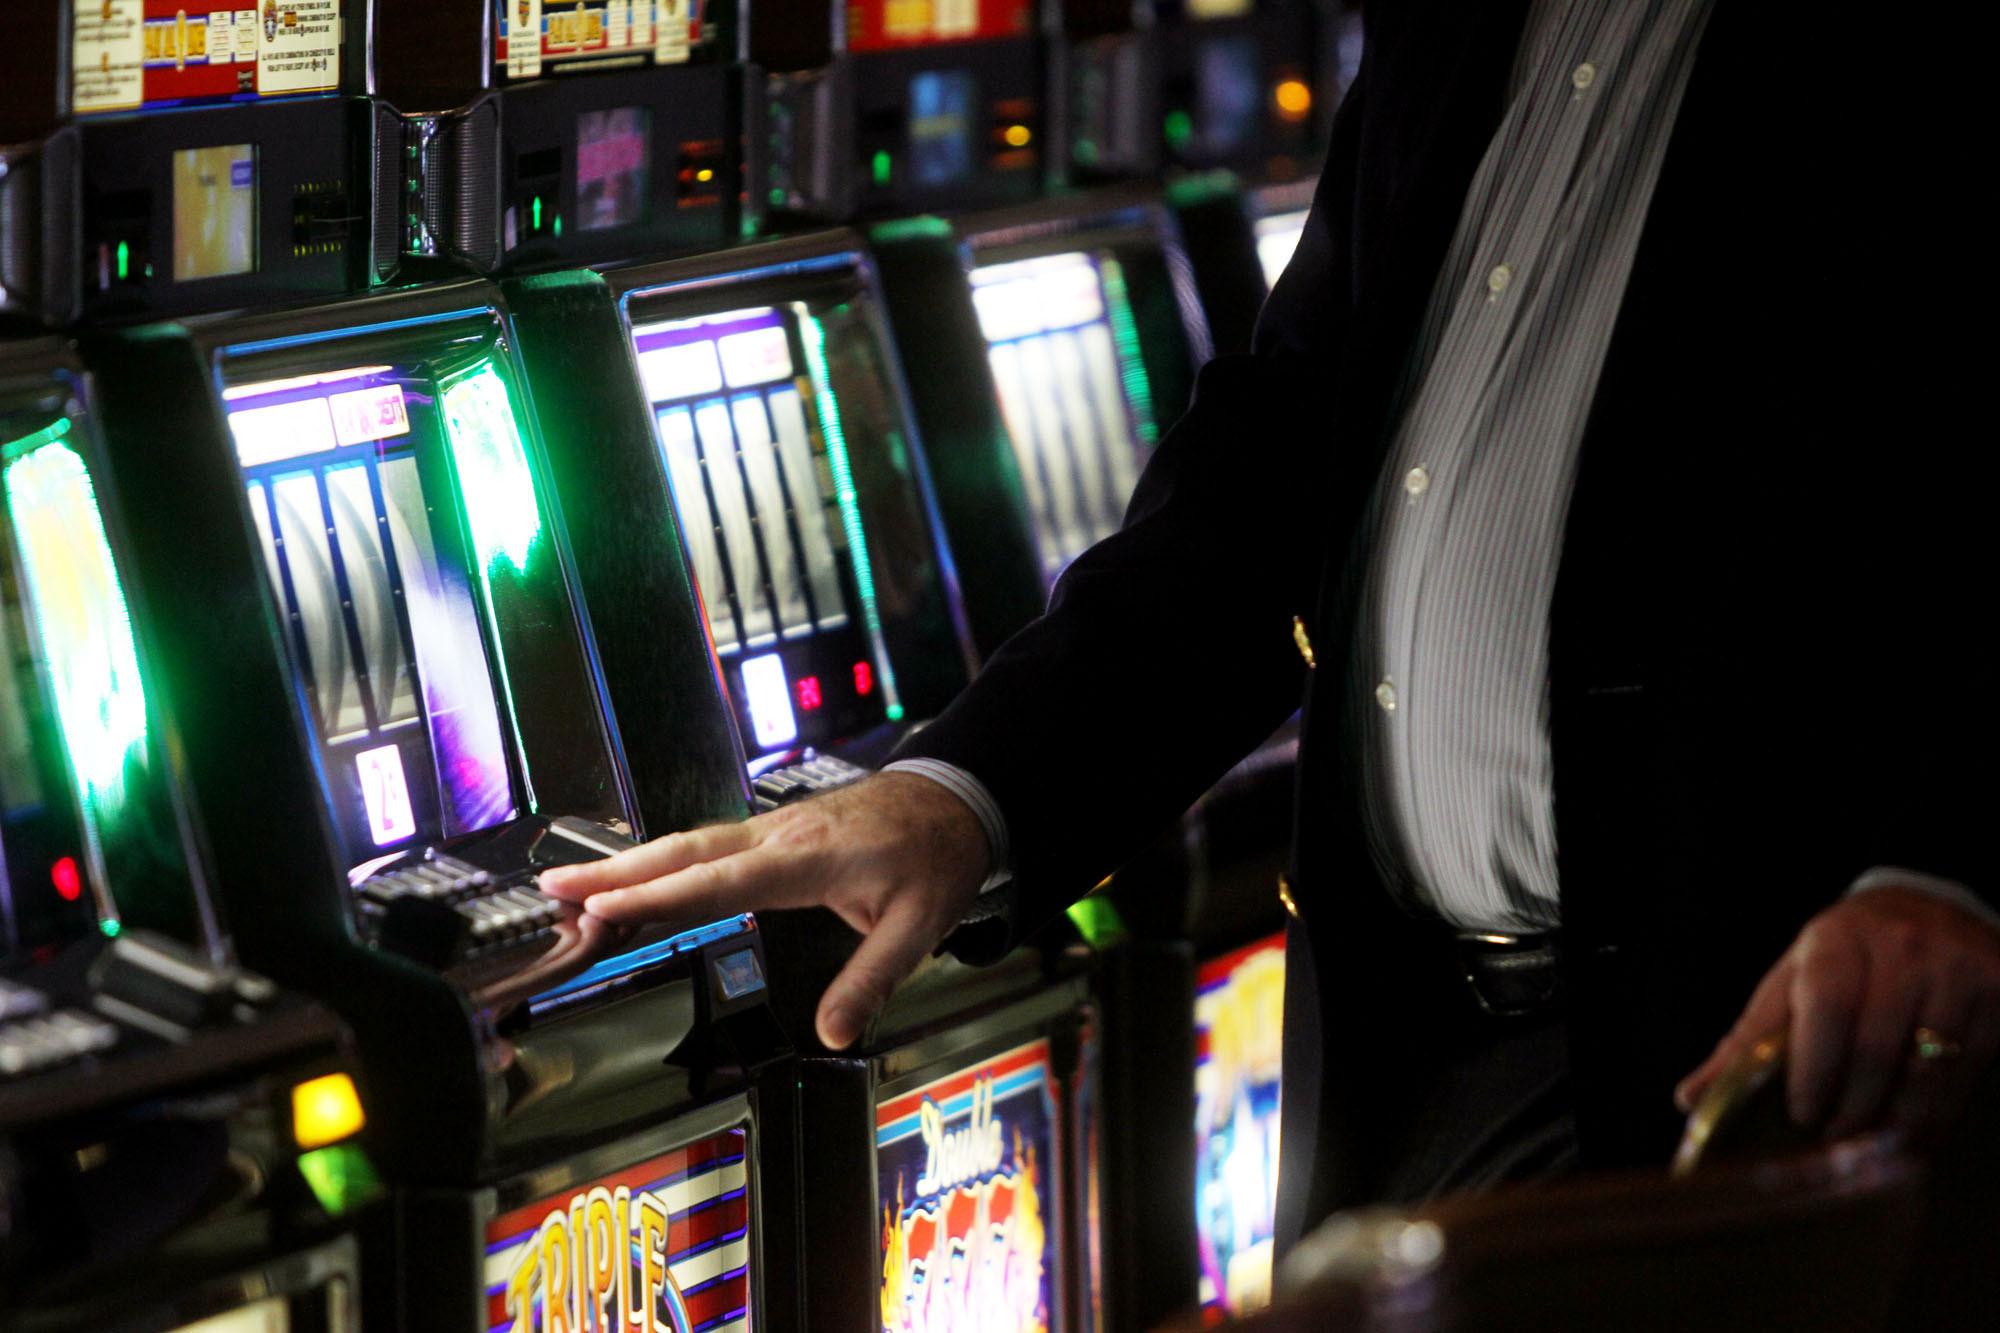 Palm beach kennel club slot machines south beach casino hotel manitoba